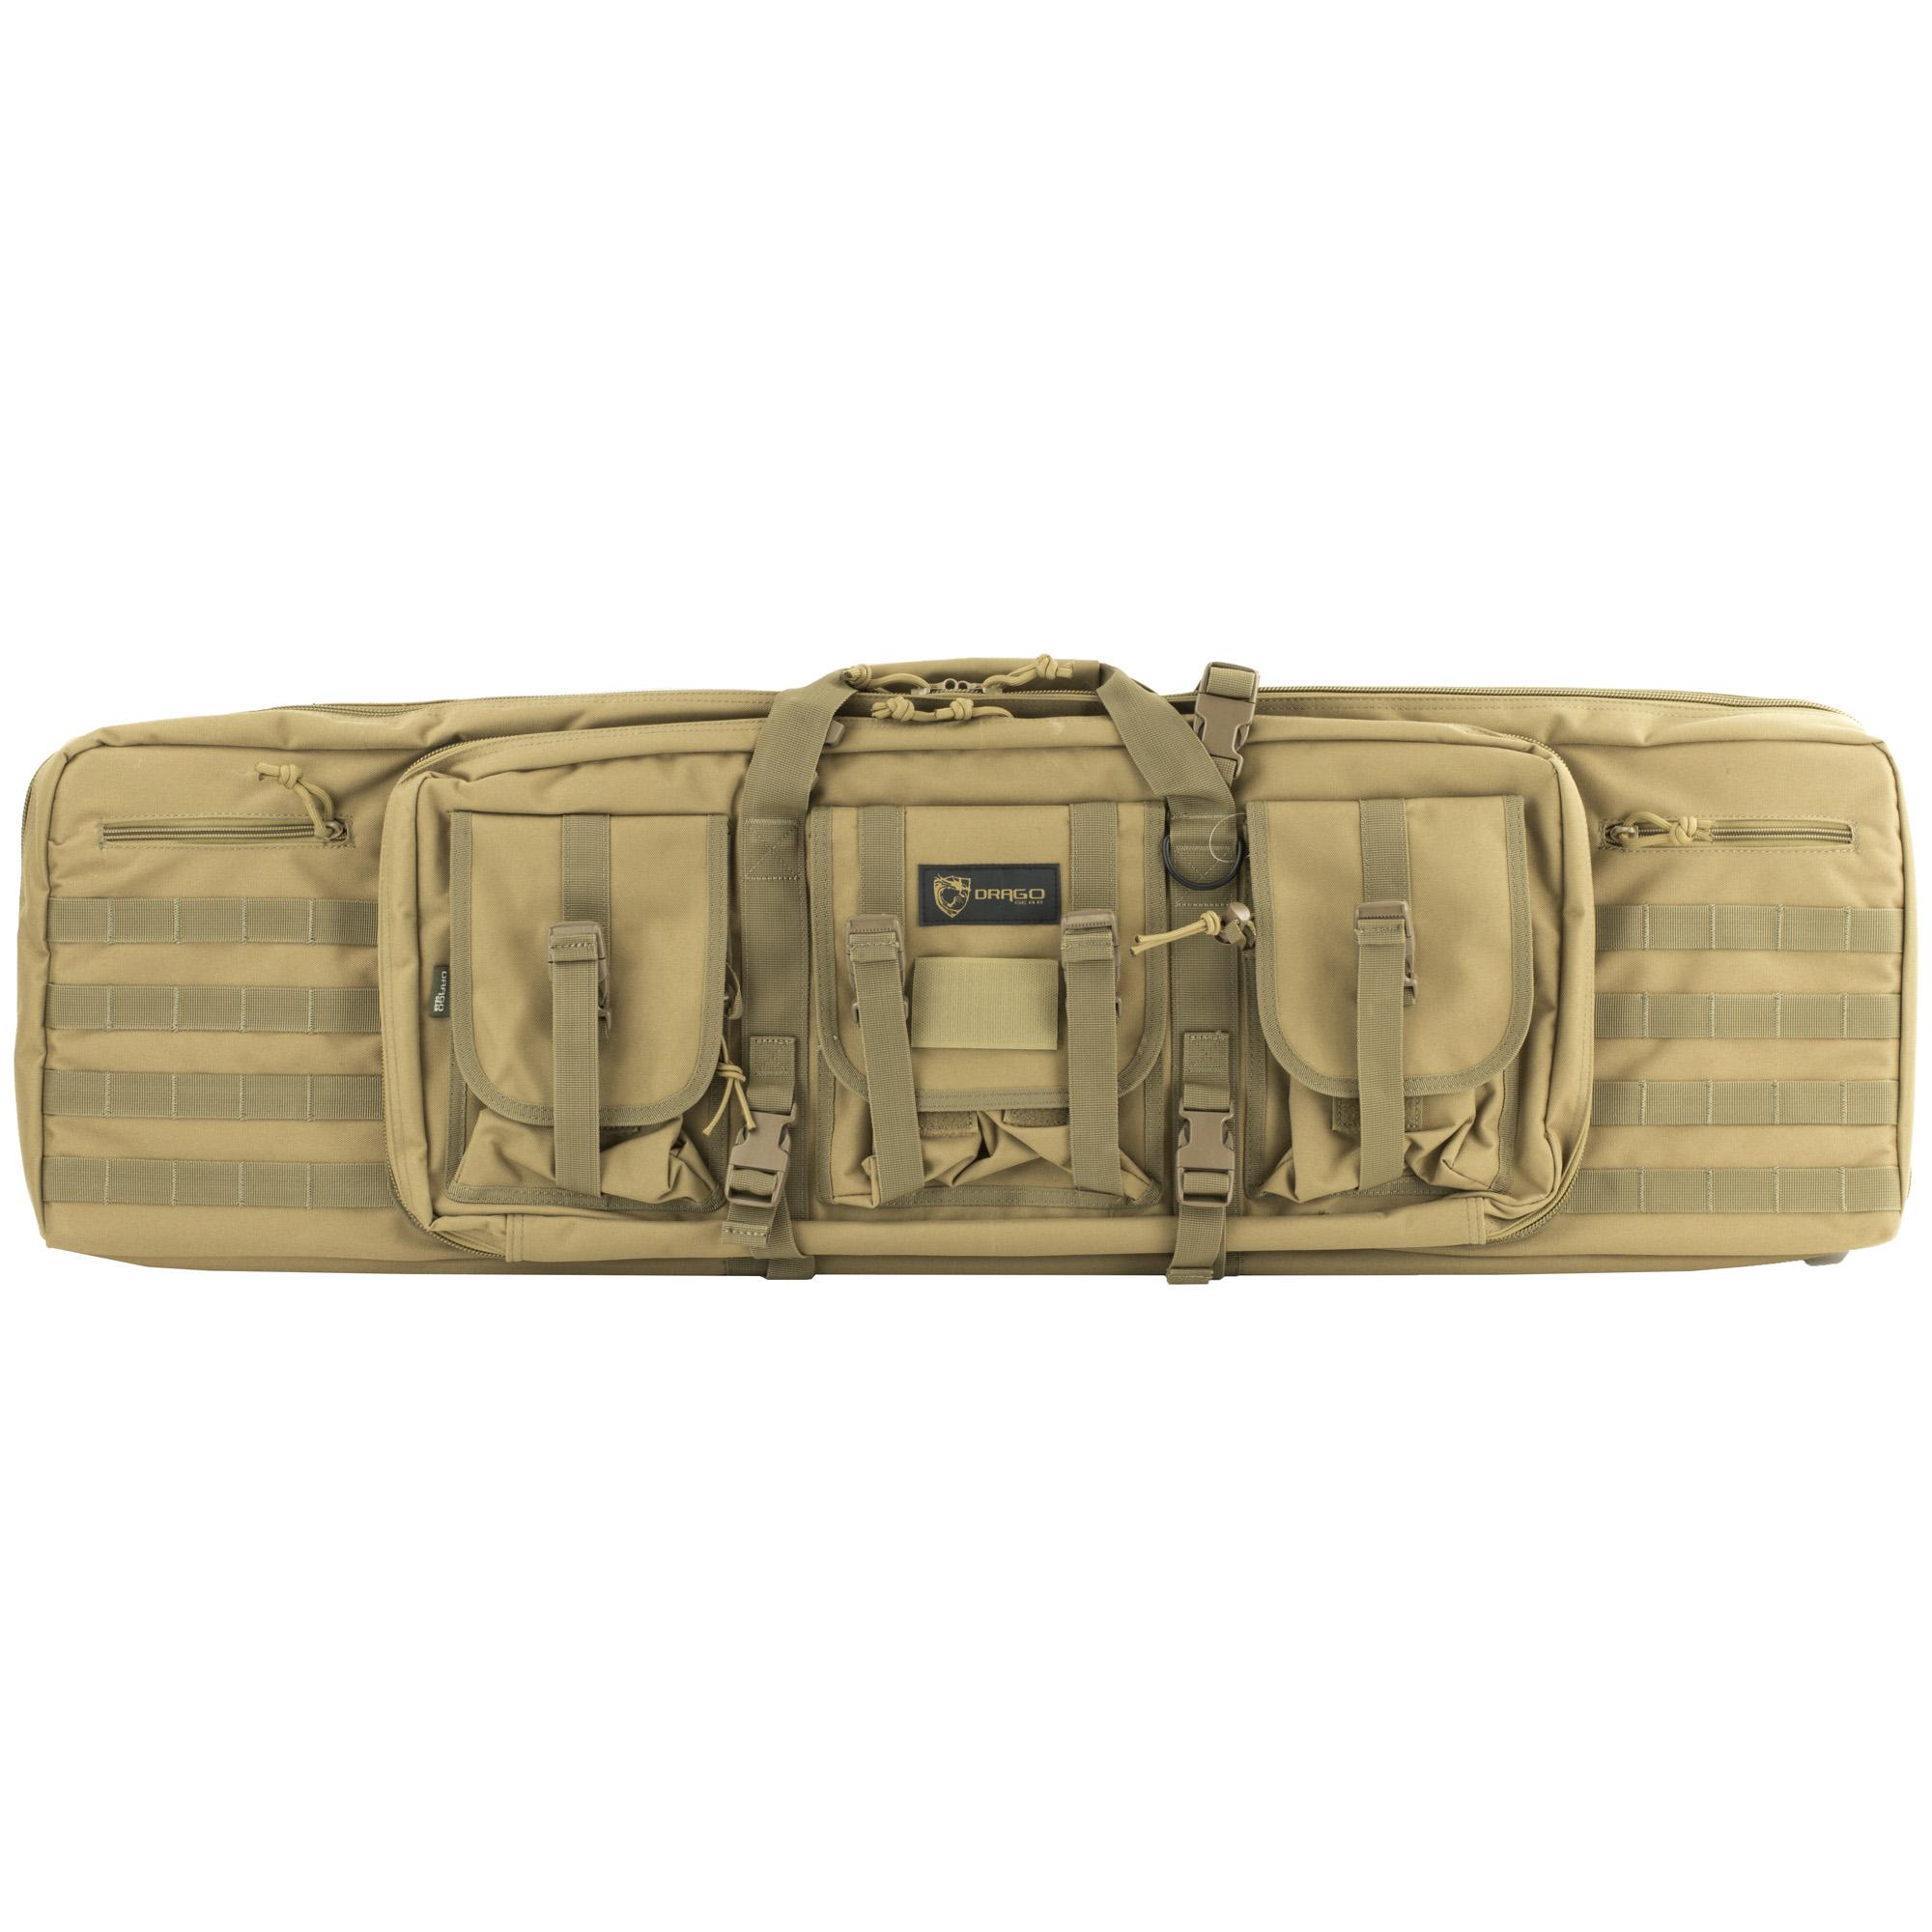 "Drago Gear Double Gun Case, Dbl Rfl Cs, Tan, 600d Polyester,42"" 12-323..."